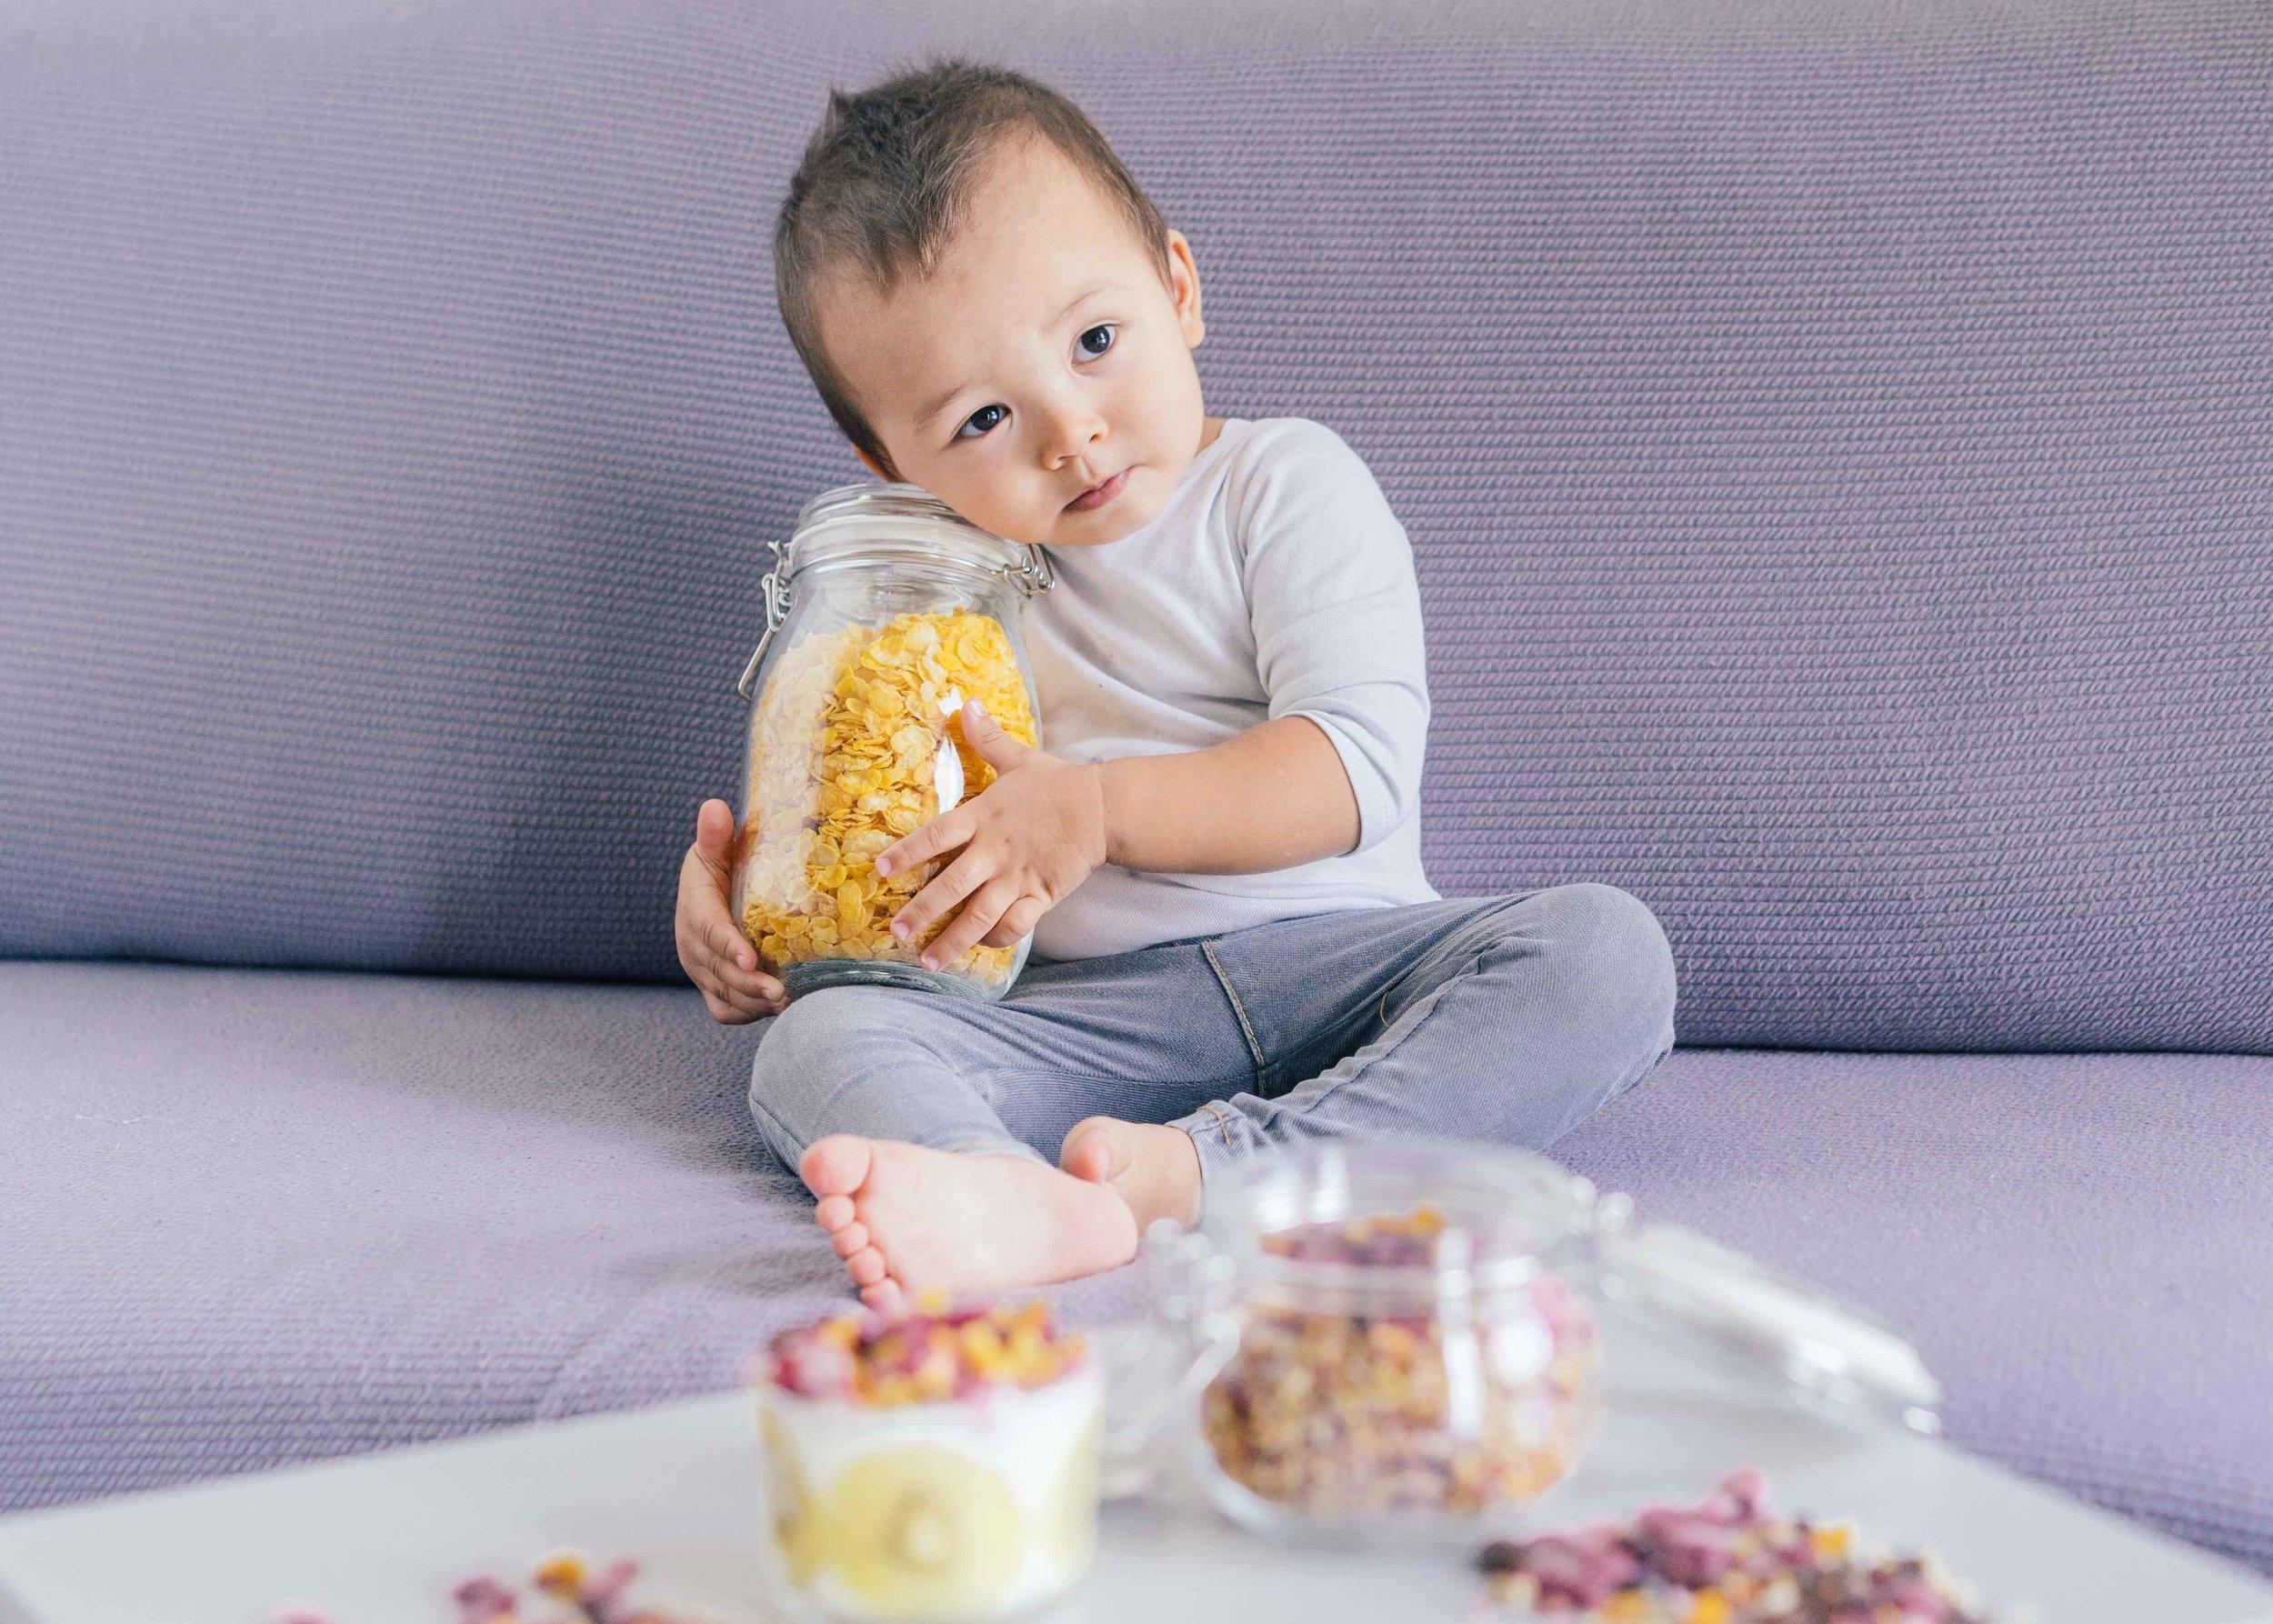 rice-and-shine-blog-quaker-granola-2018-06-04-14.jpg